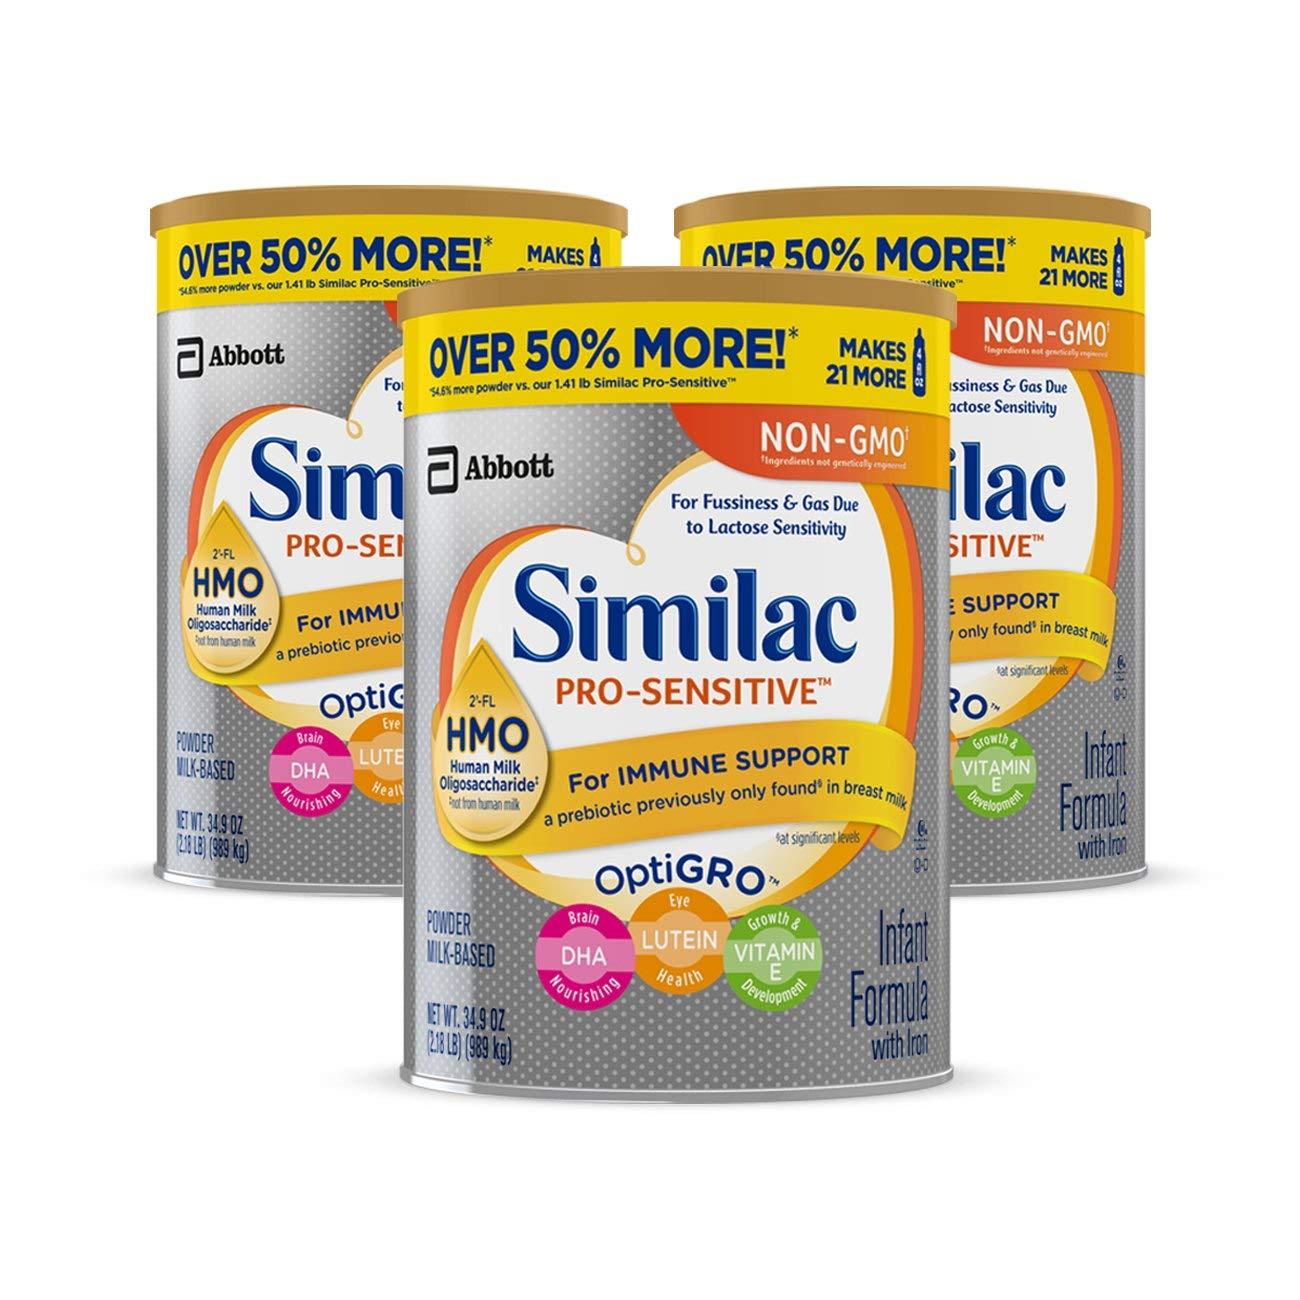 LIVE AGAIN - 3-Pack 36oz Similac Pro-Advance Non-GMO Infant Formula w/ Iron $58.43